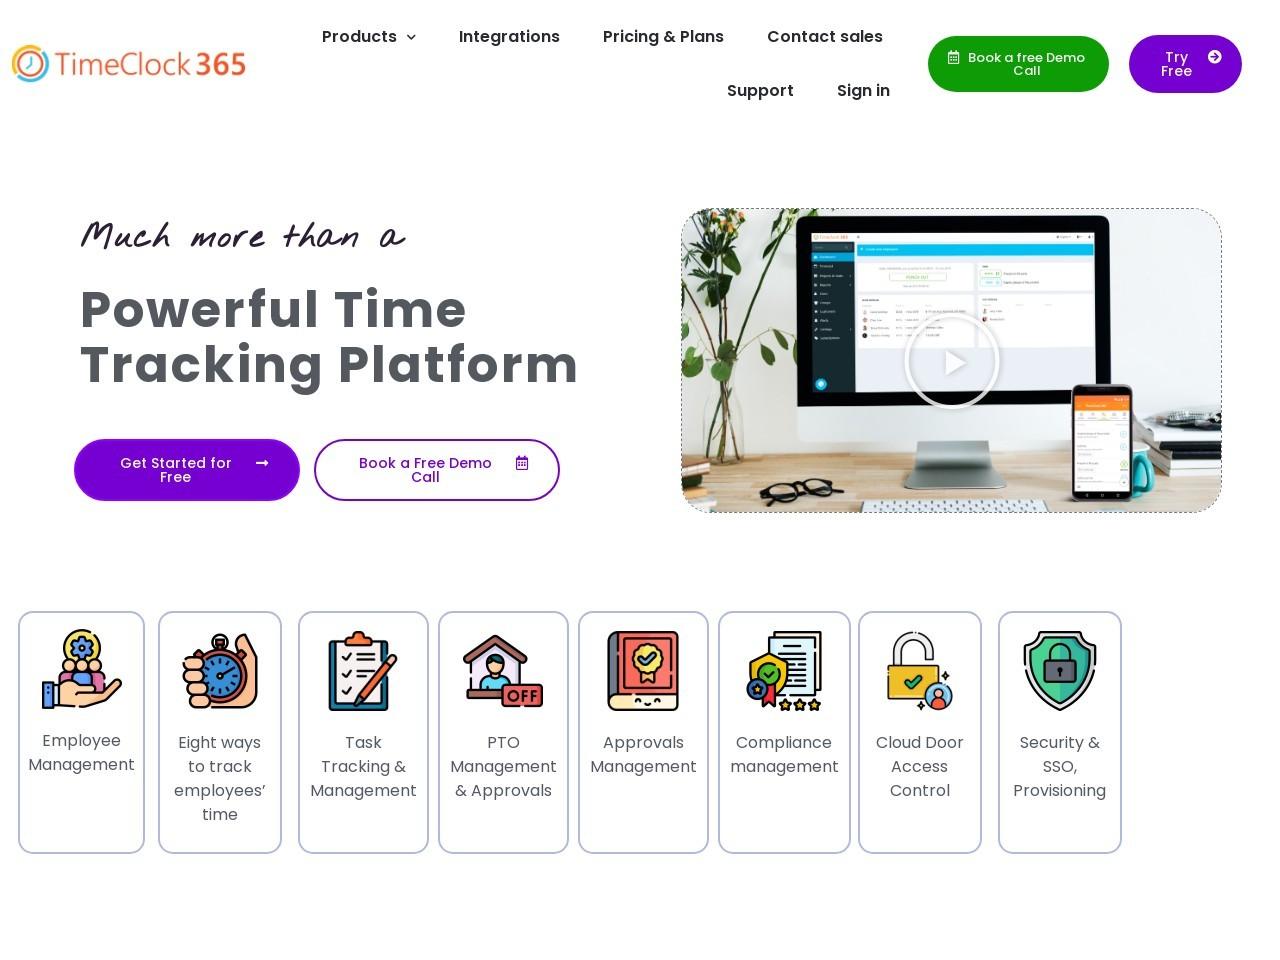 TimeClock365